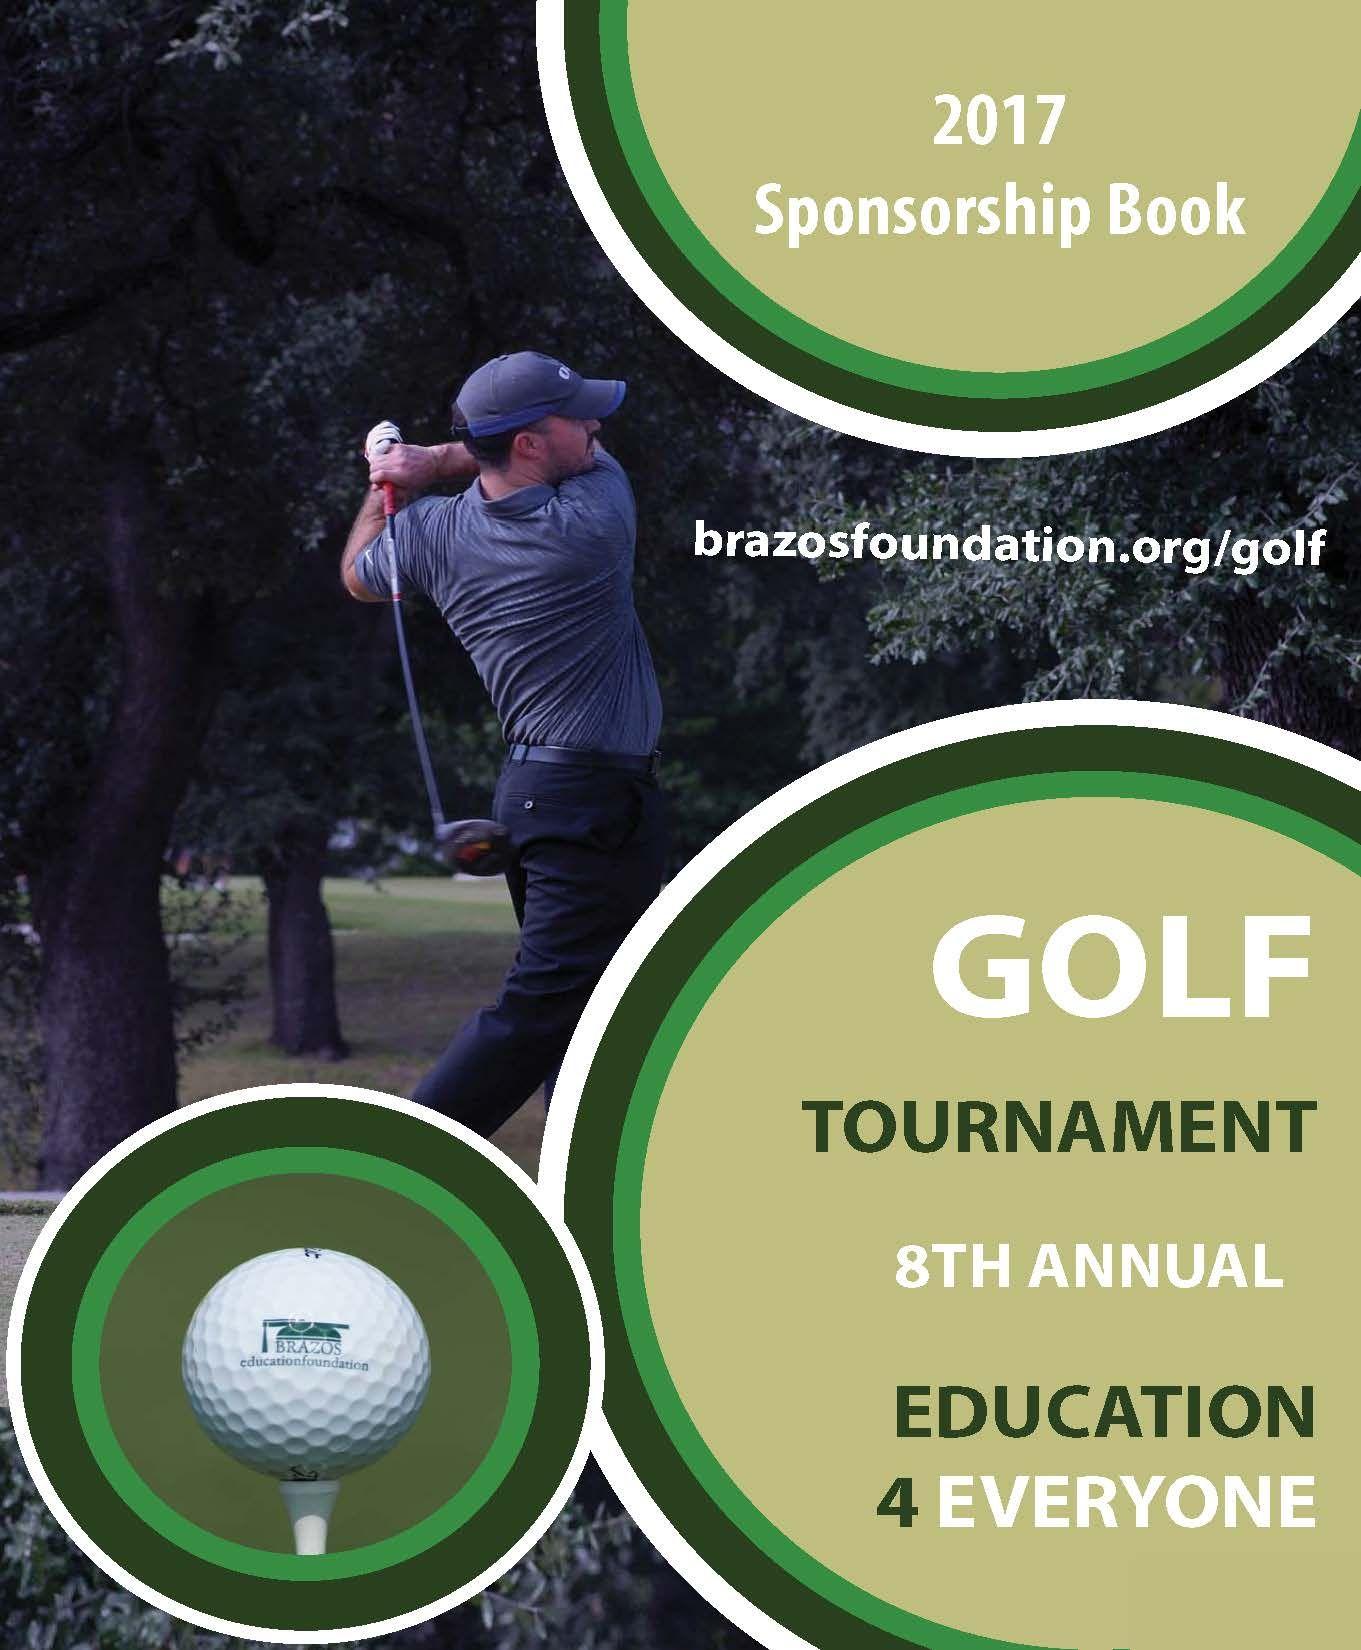 2017 Sponsorship Book